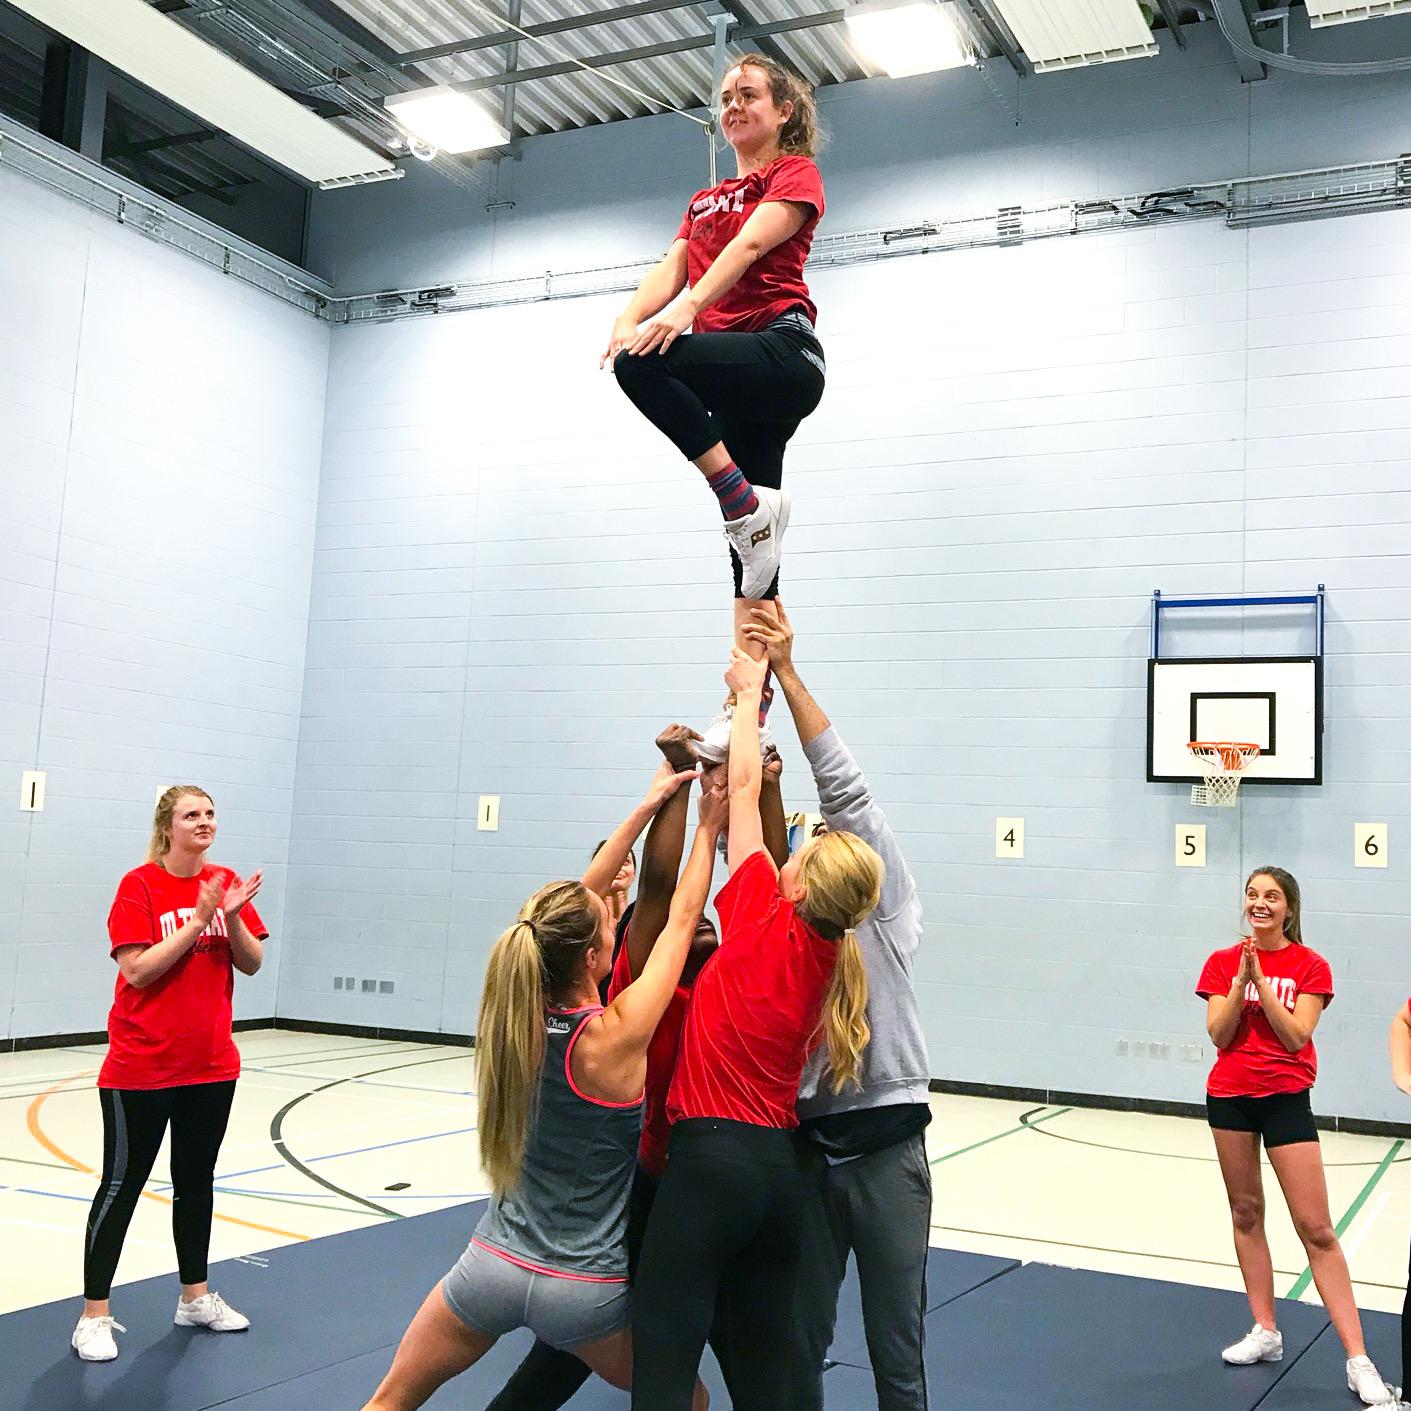 Adult cheerleading in London